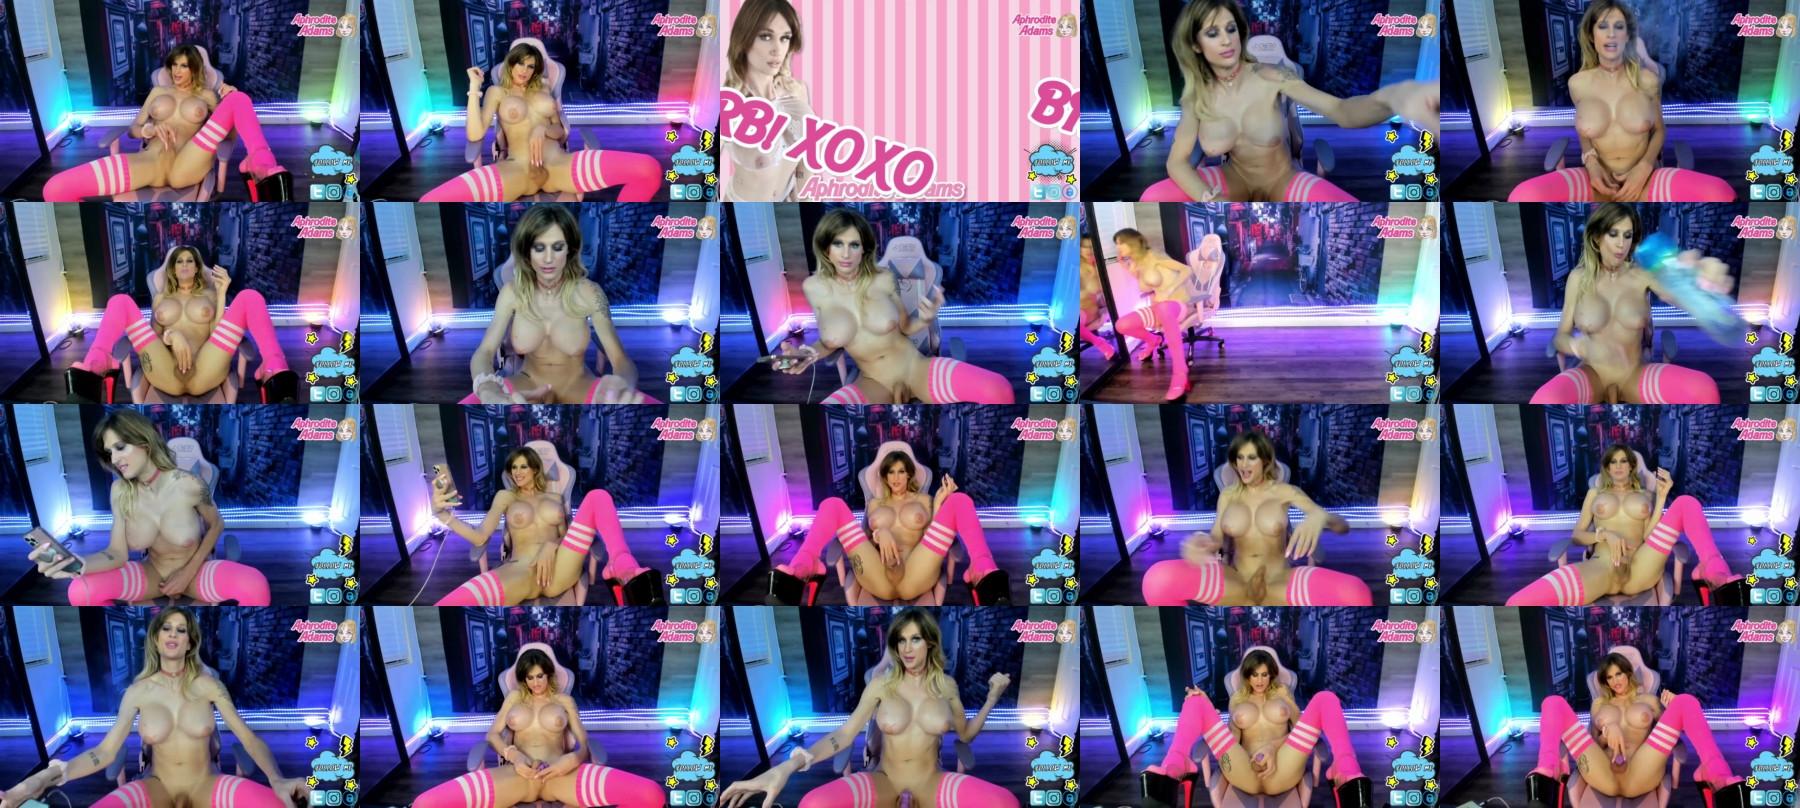 Tsaphroditeadams ts 15-05-2021 Chaturbate trans Naked